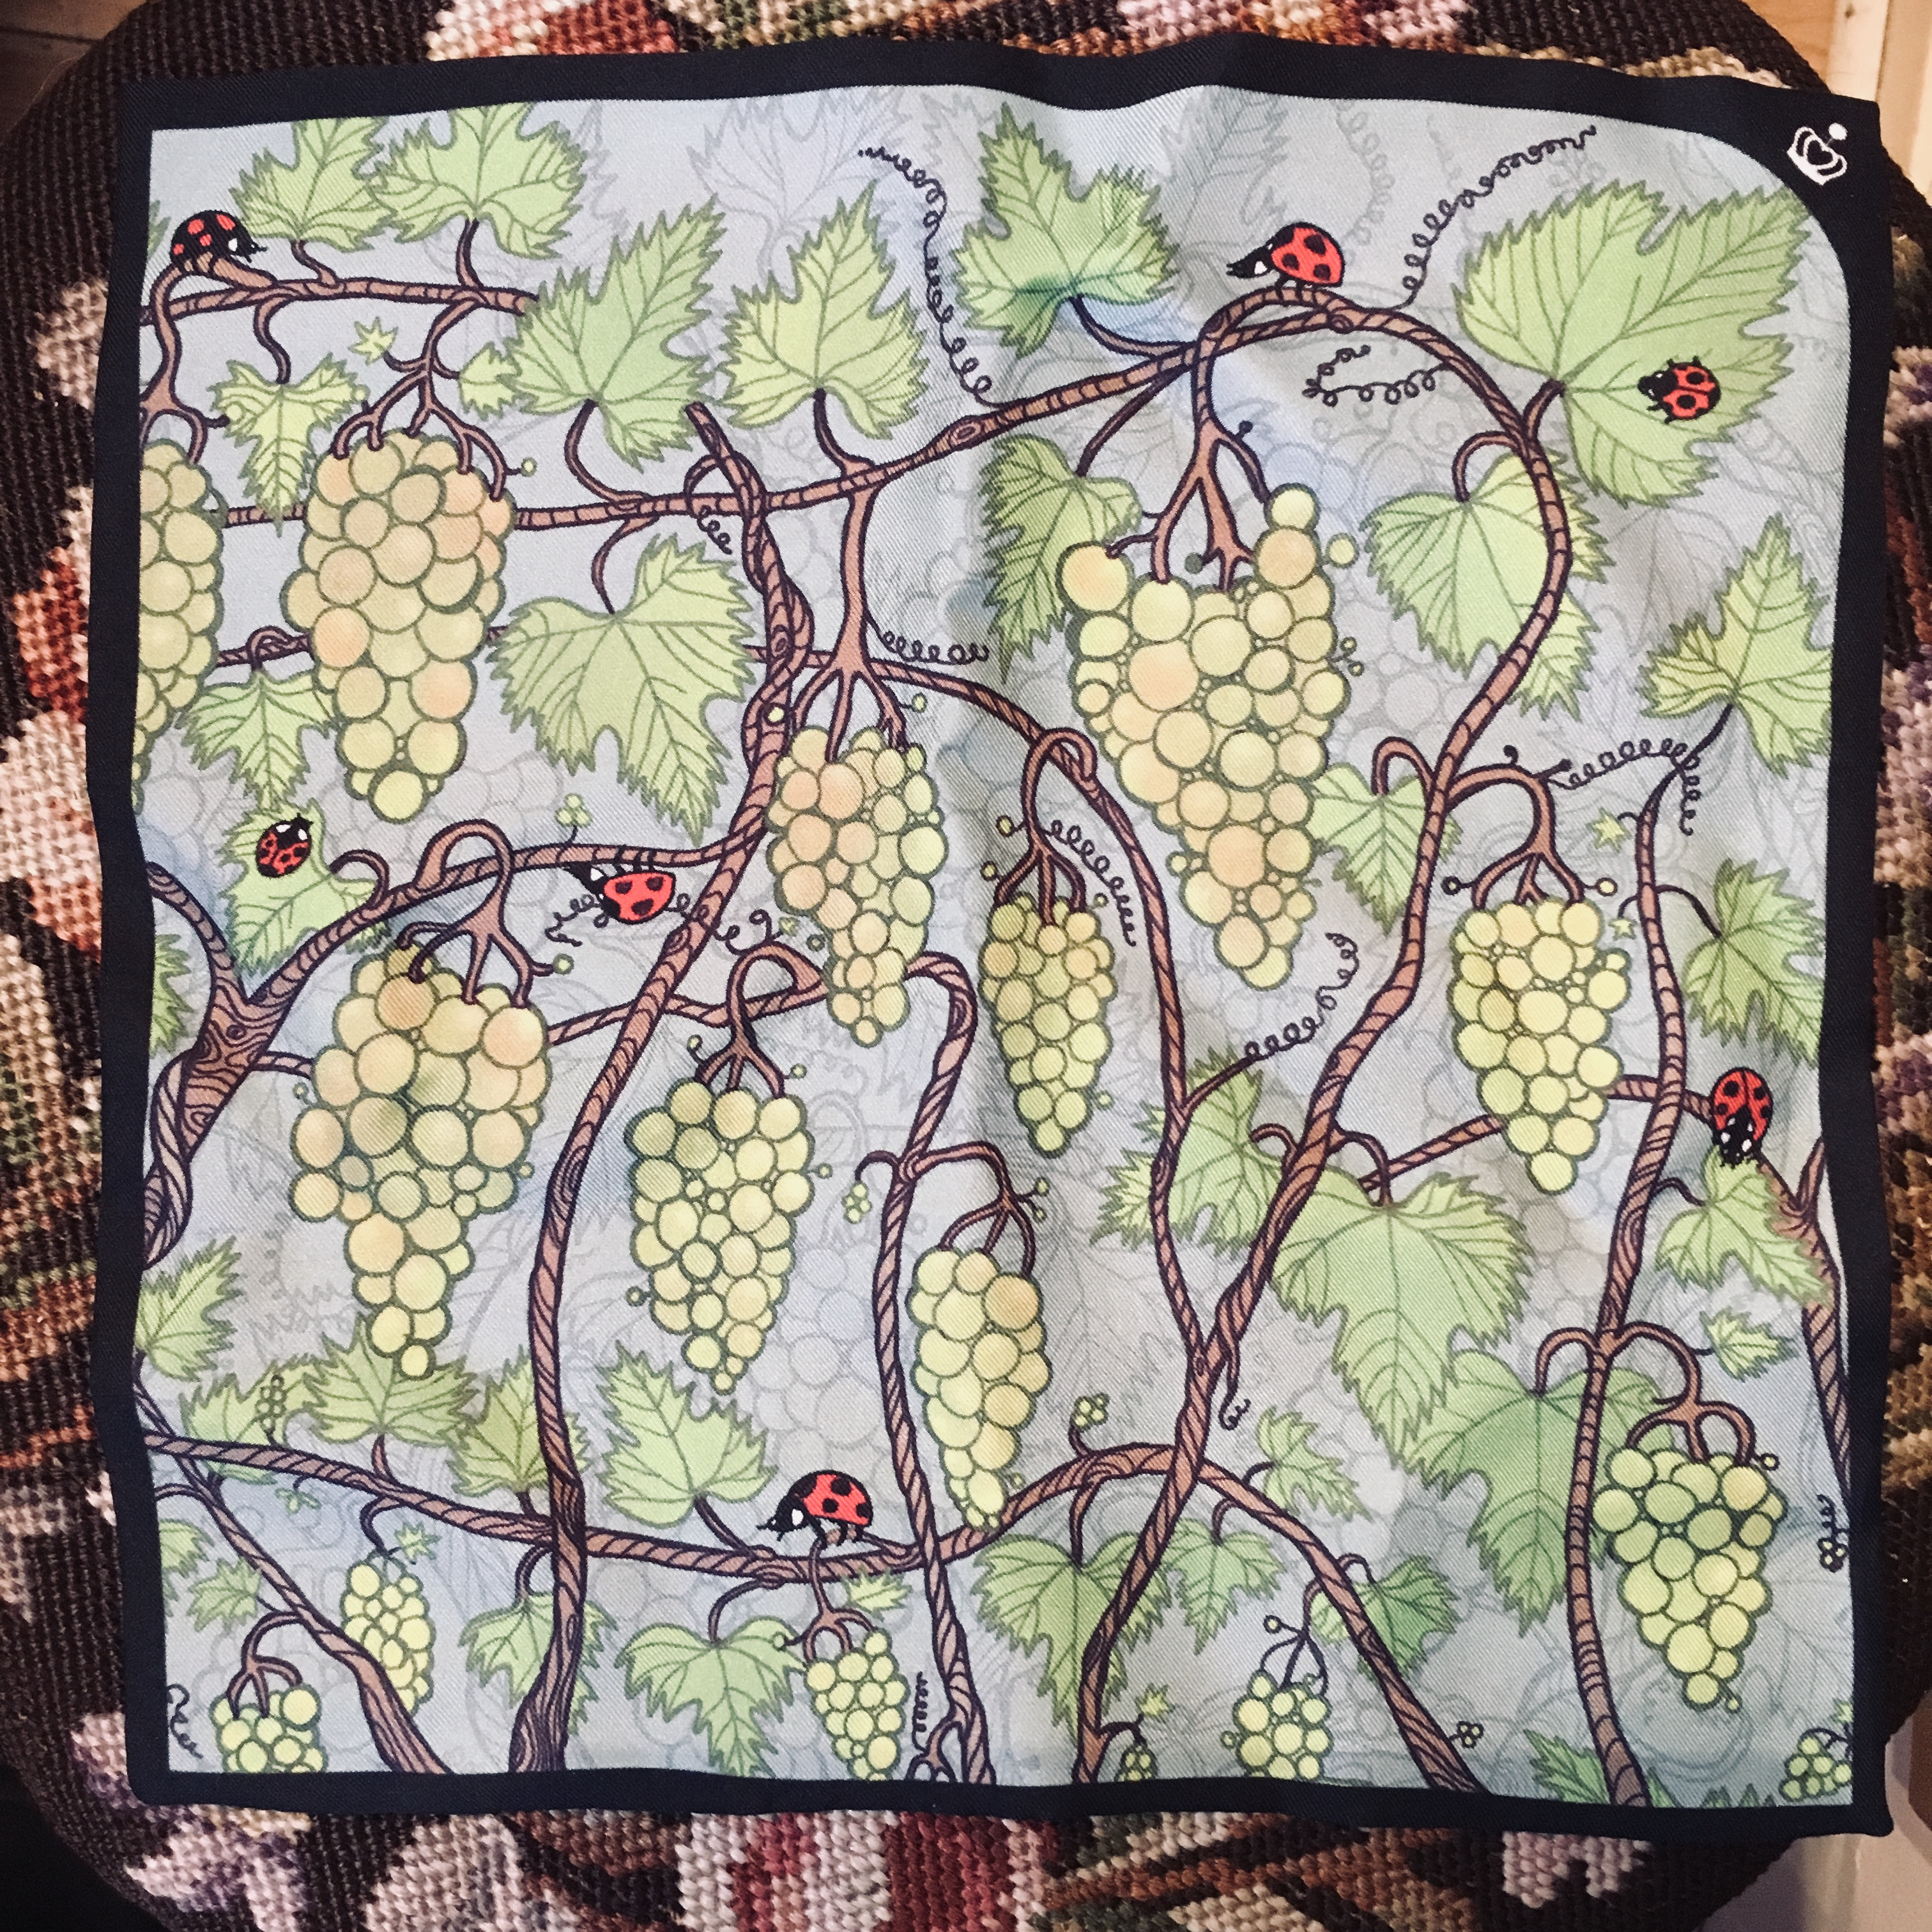 Kueen, Perfectly pocket, la vita del vino/poppy